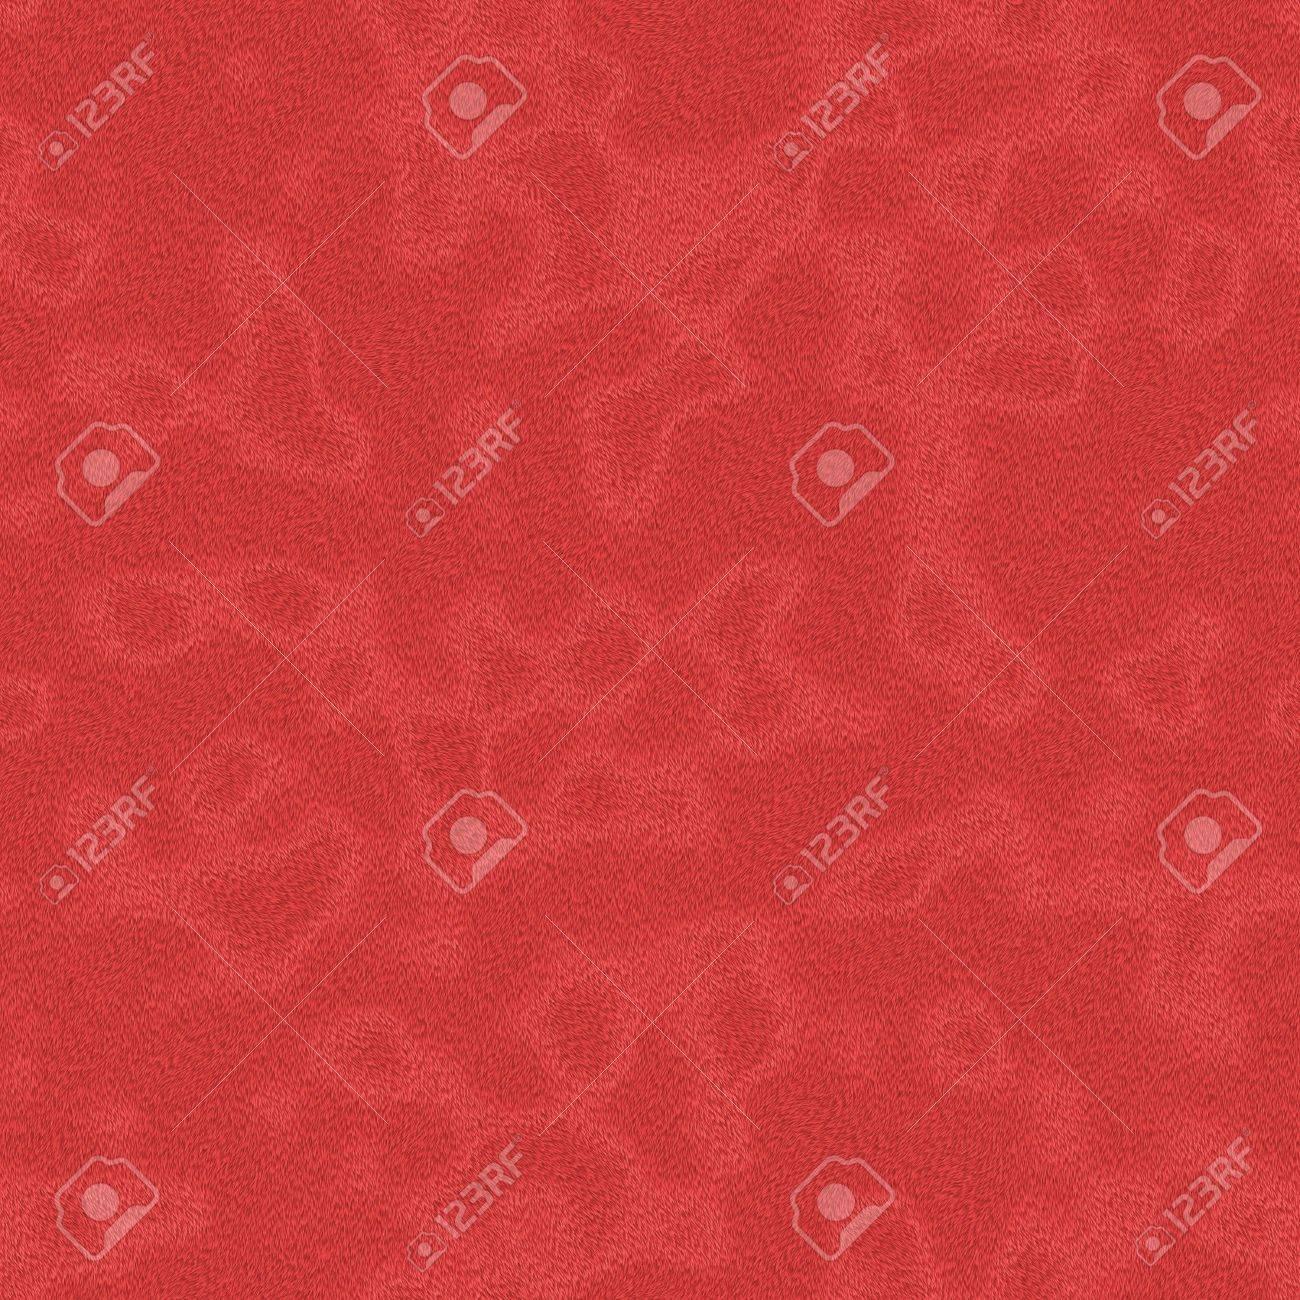 seamless red carpet texture. seamless red carpet texture